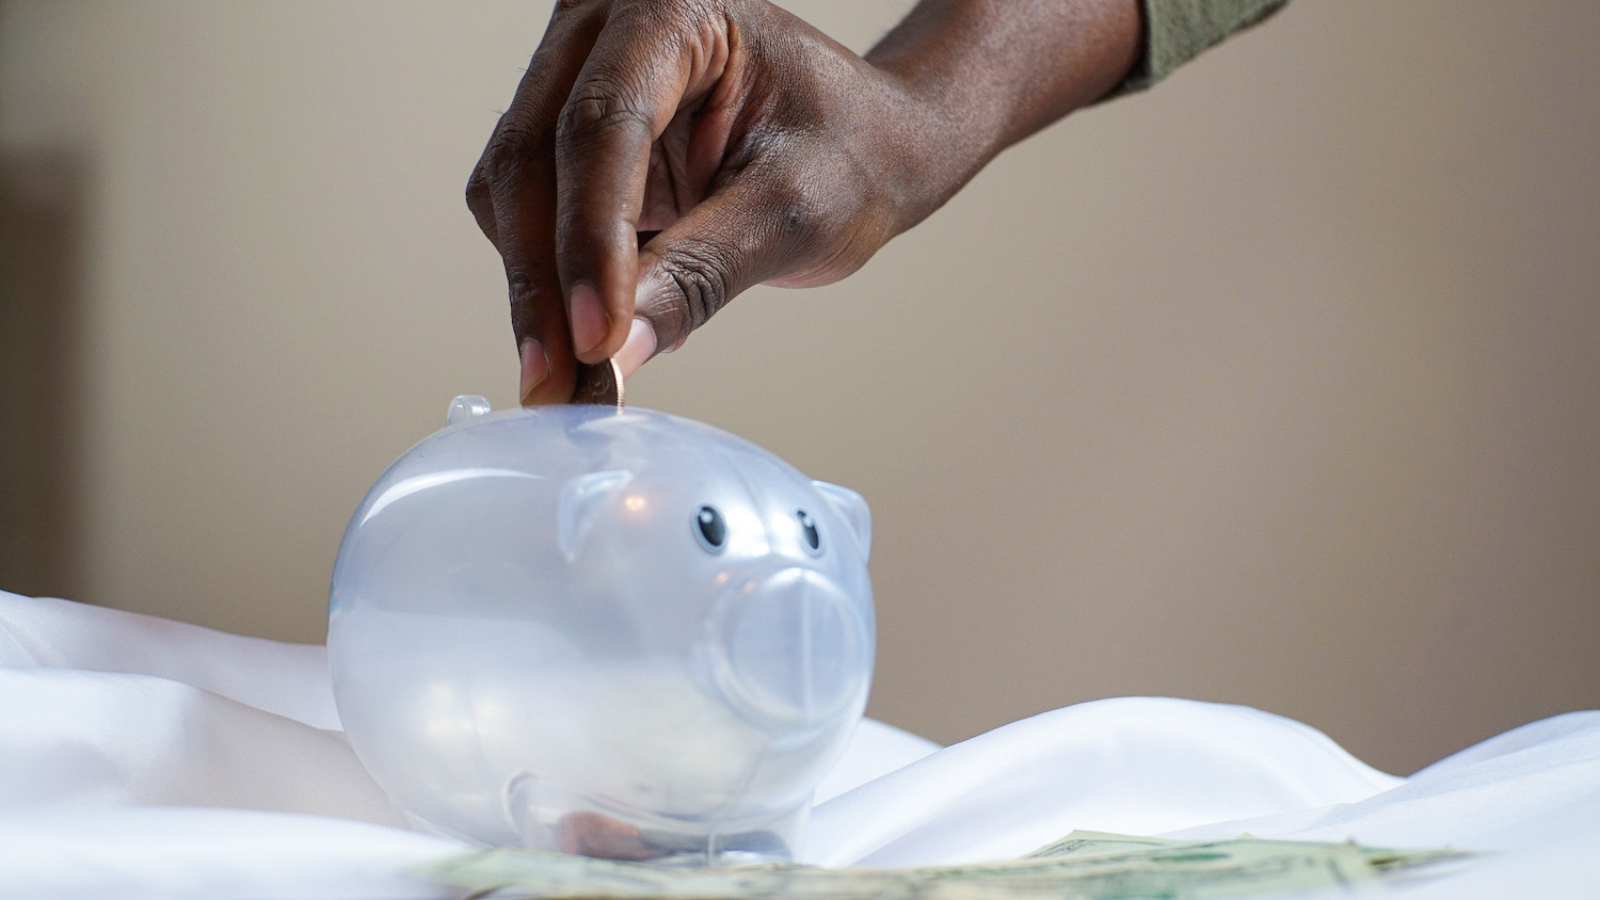 plastic-piggy-bank-3833052